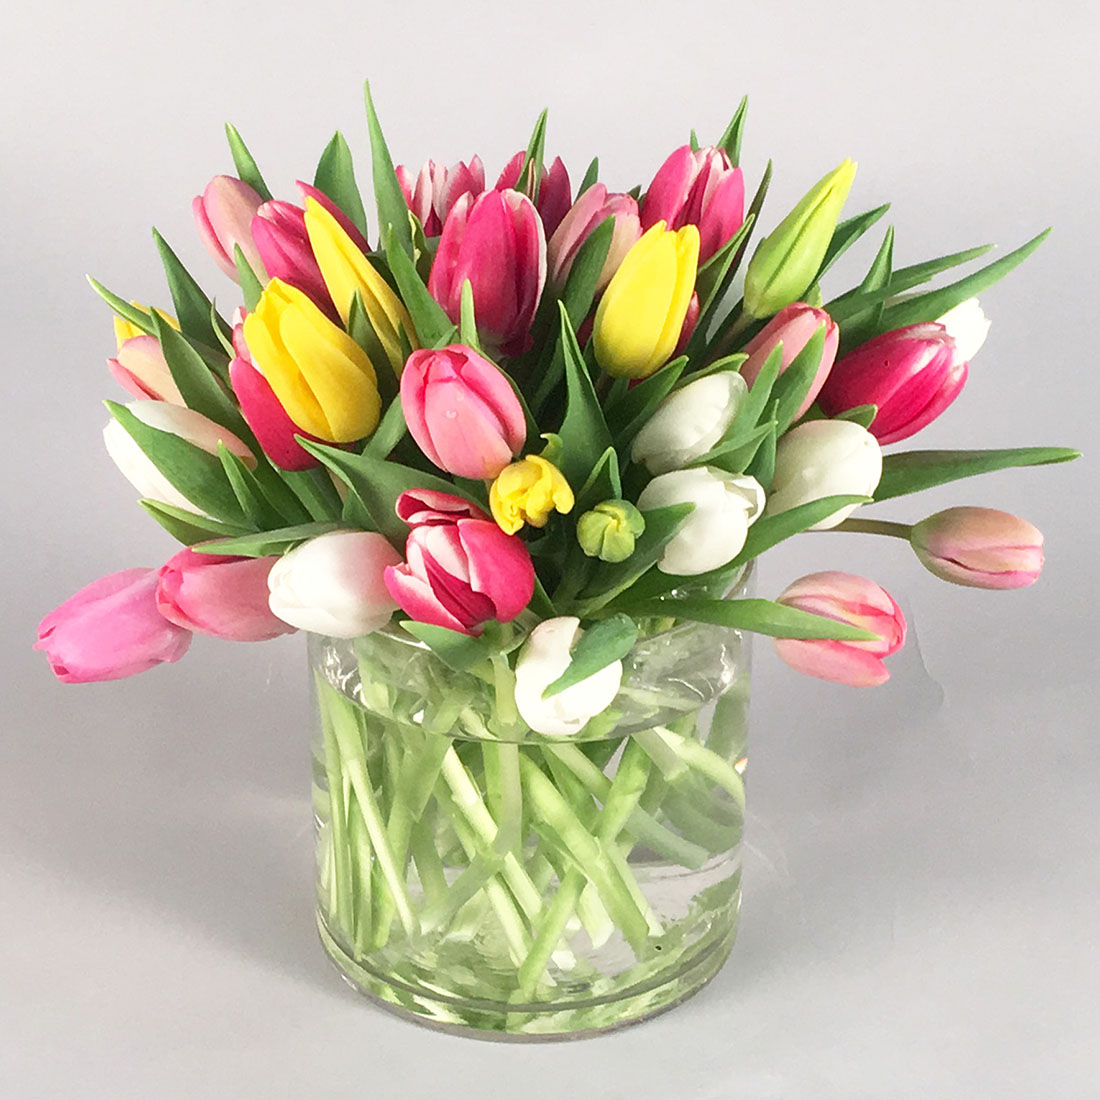 Scentsational Blooms